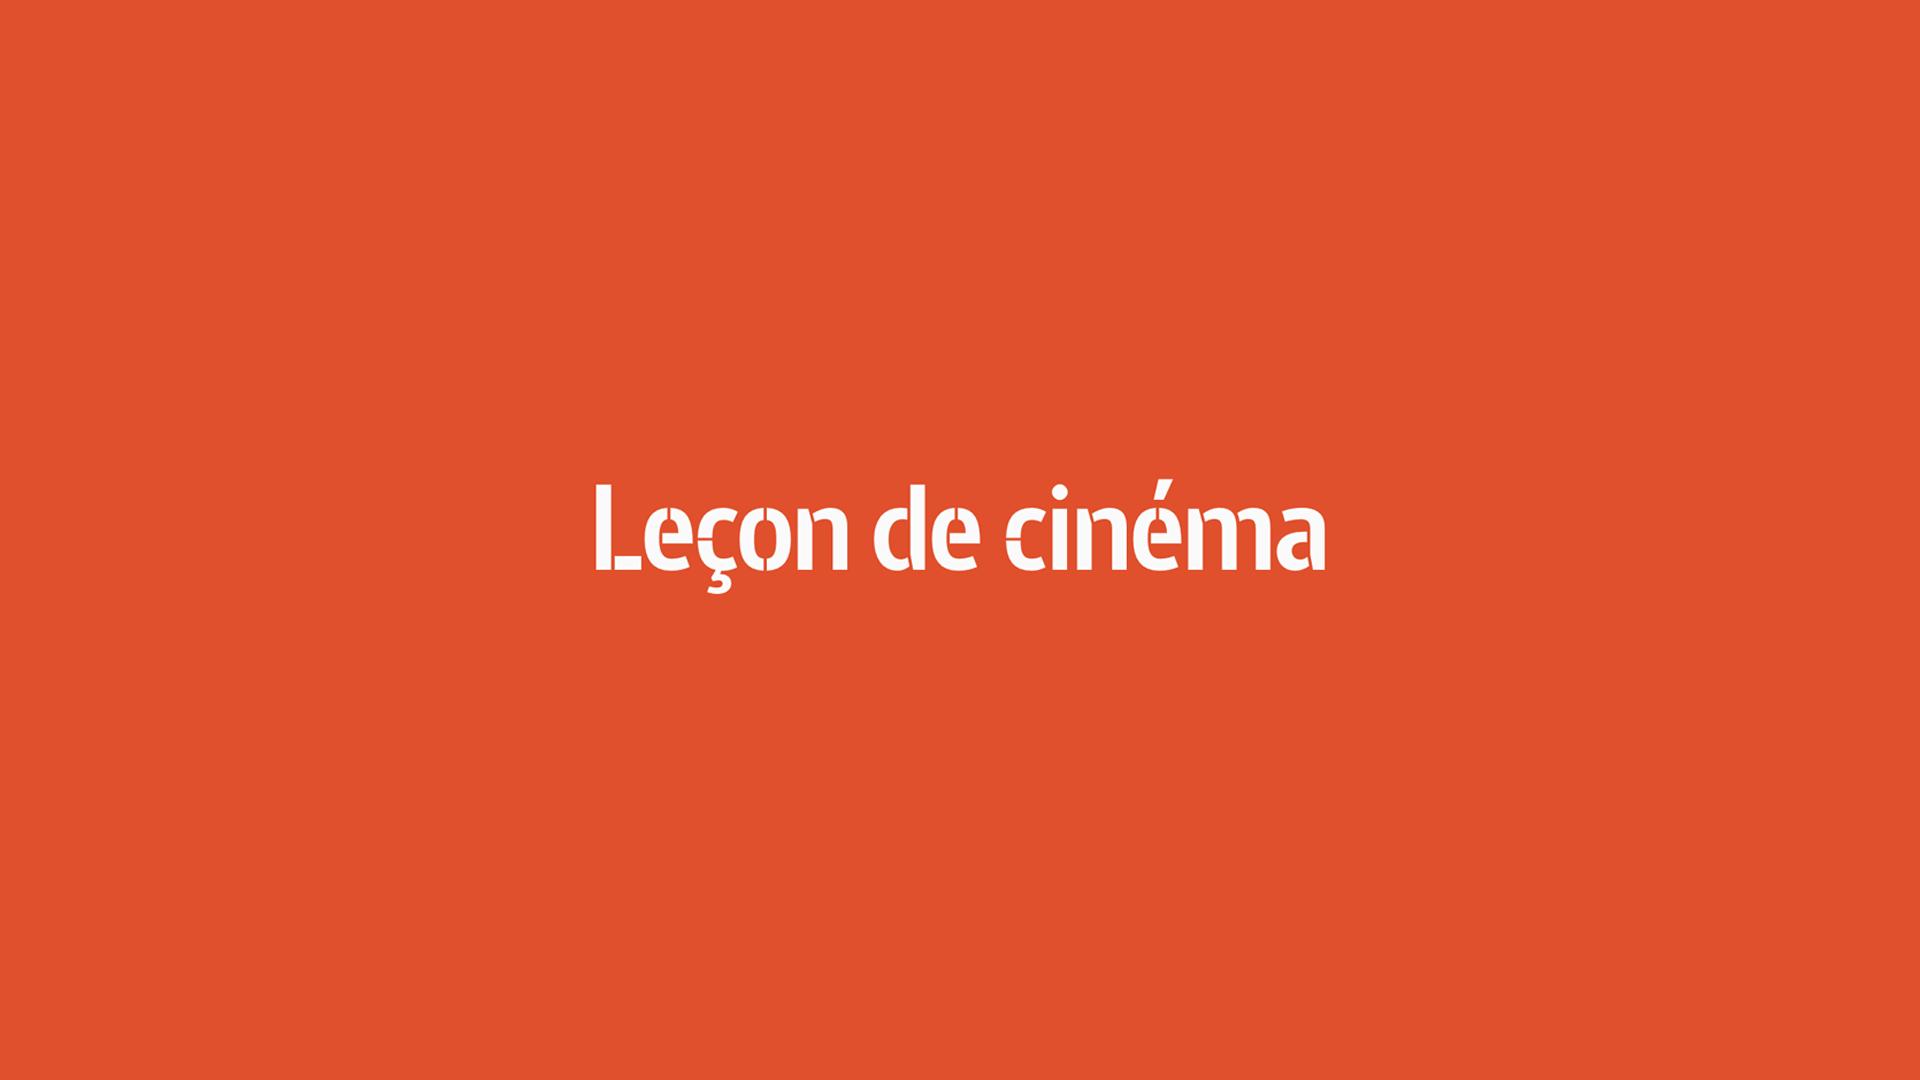 Leçon de cinéma